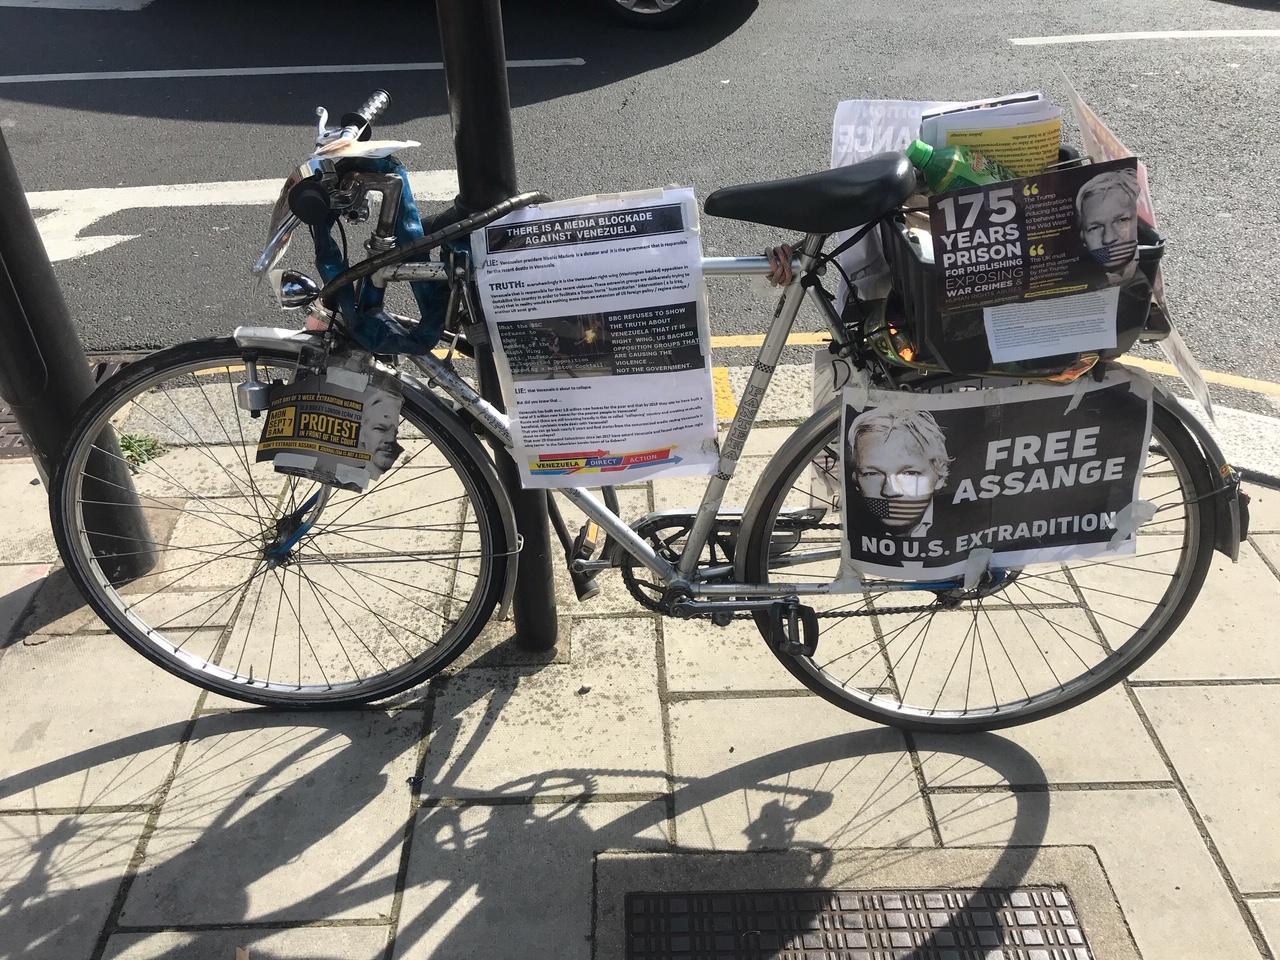 protest-bike--old-bailey-london-sept20.jpg